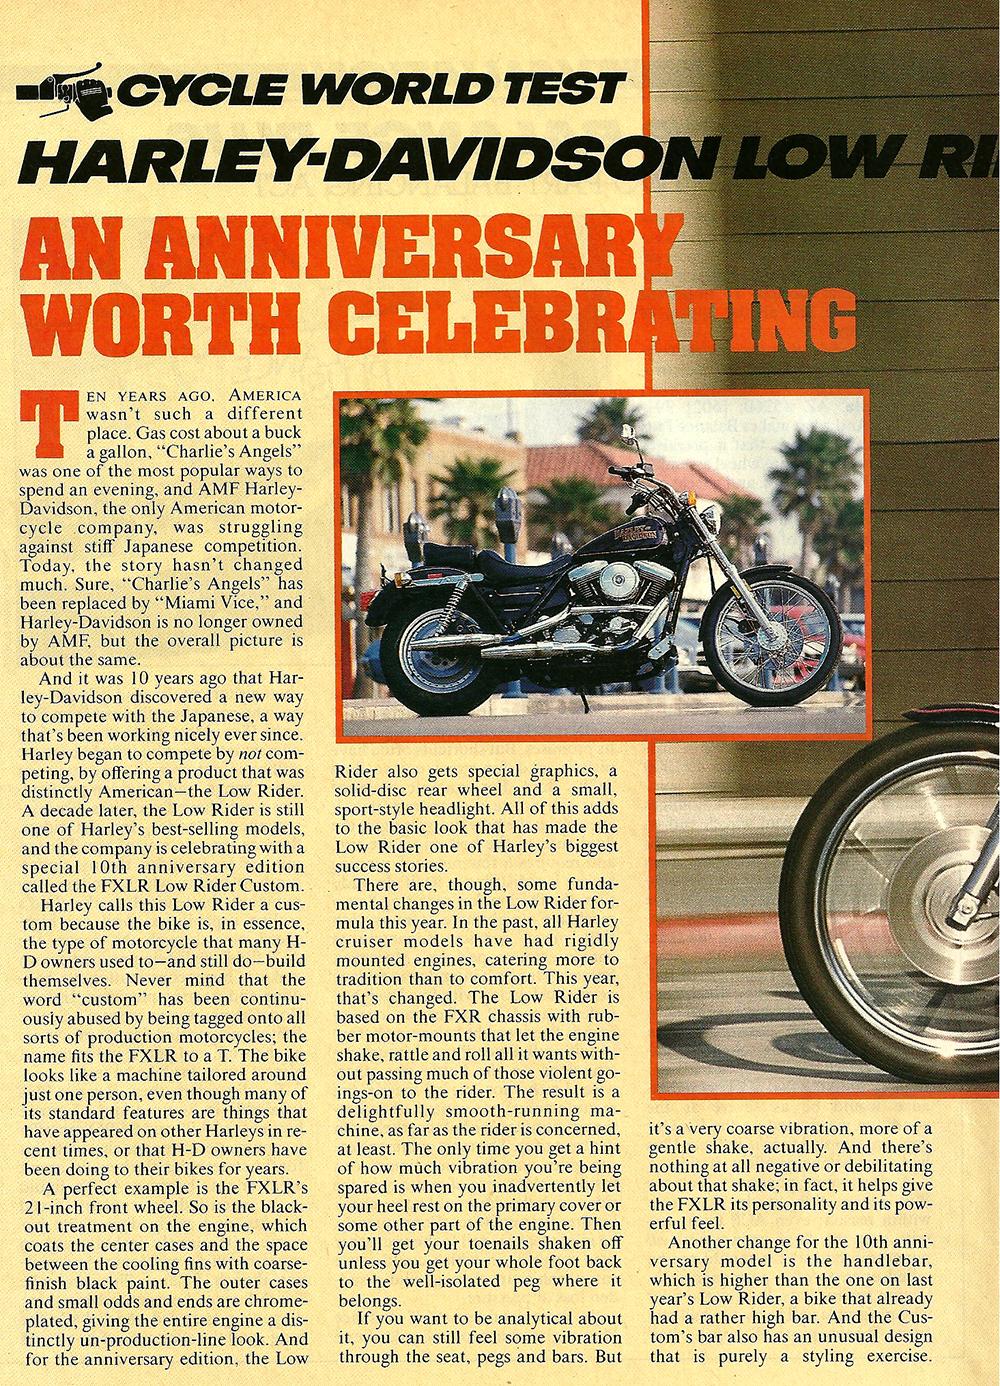 1987 Harley low rider custom fxlr road test 01.jpg